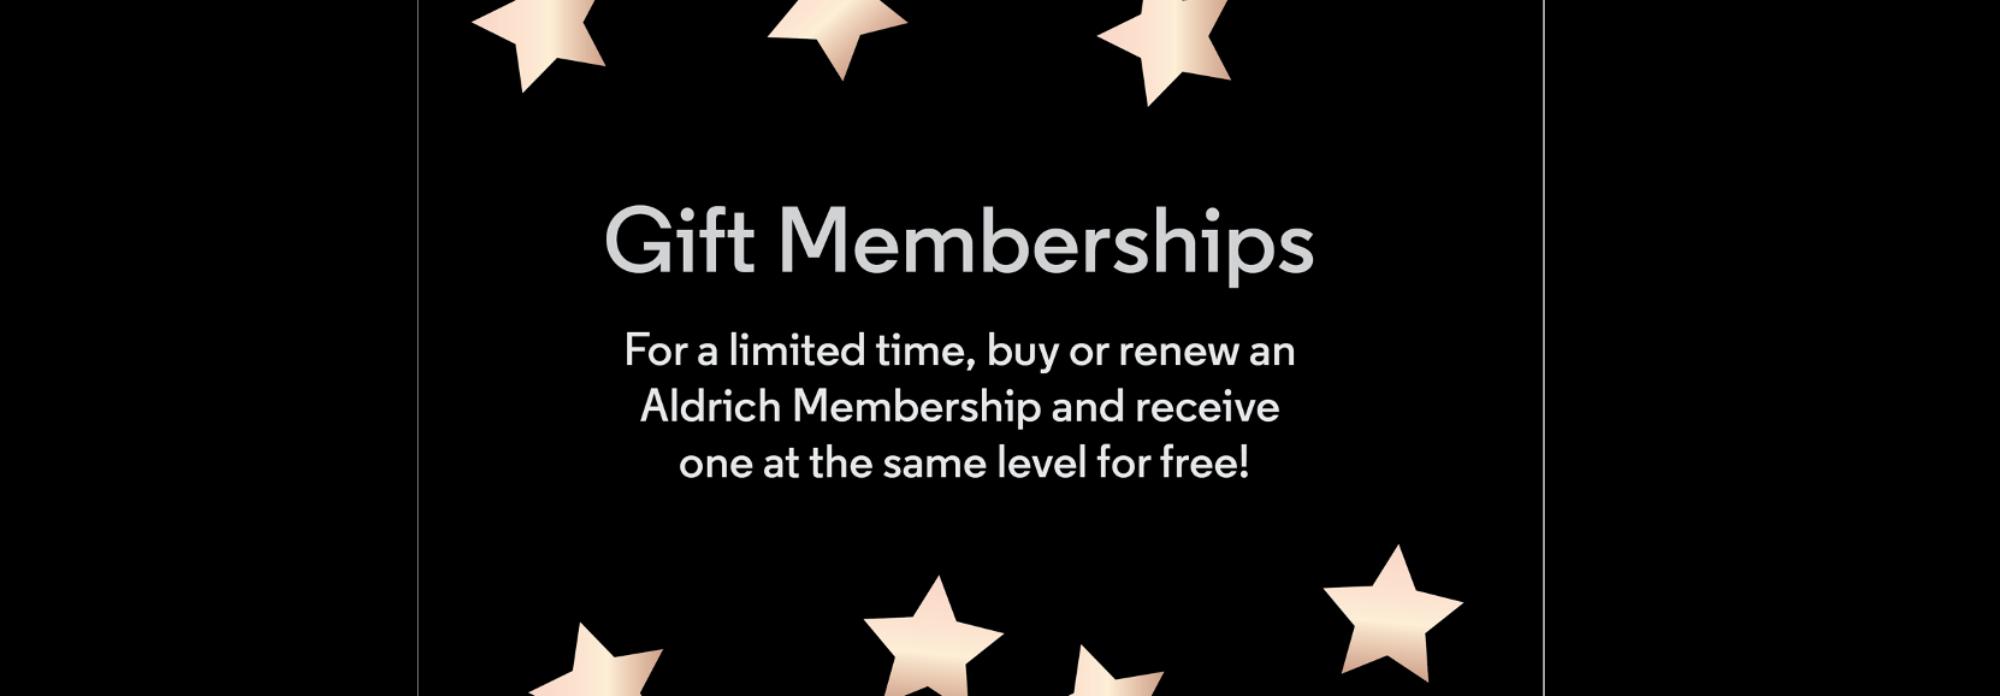 Gift membership 2 for 1